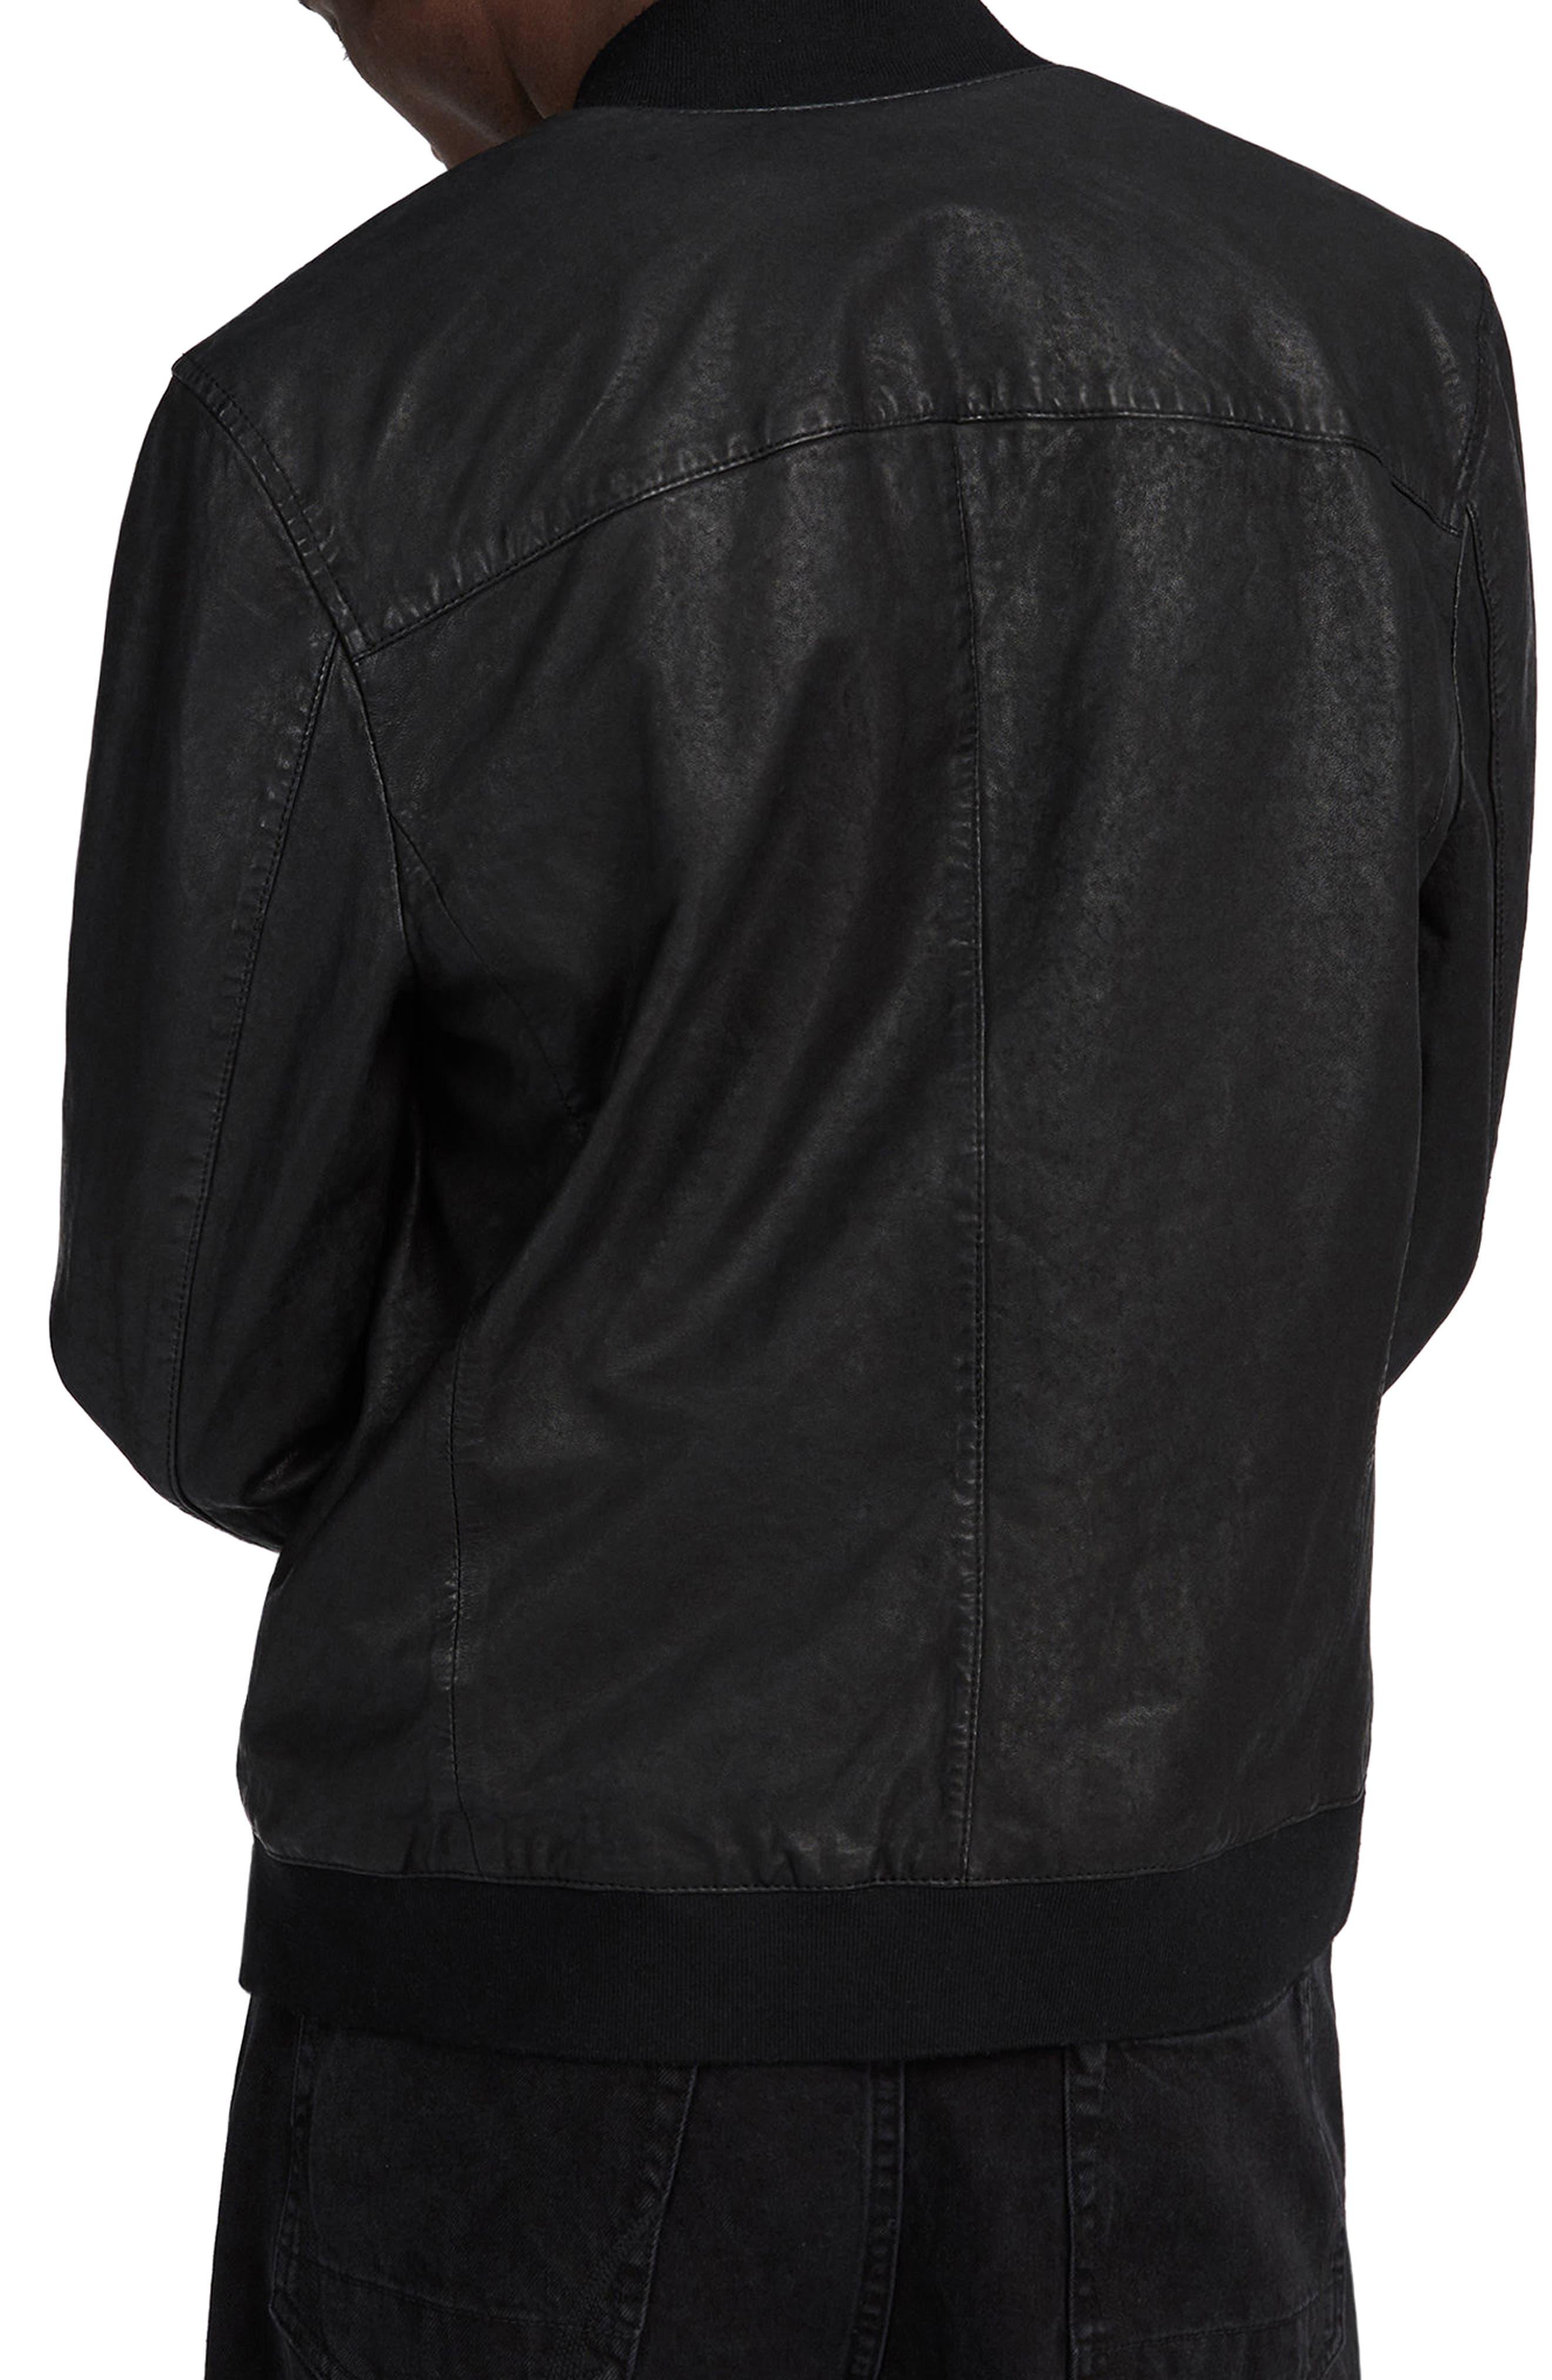 ALLSAINTS, Kino Leather Bomber Jacket, Alternate thumbnail 2, color, BLACK